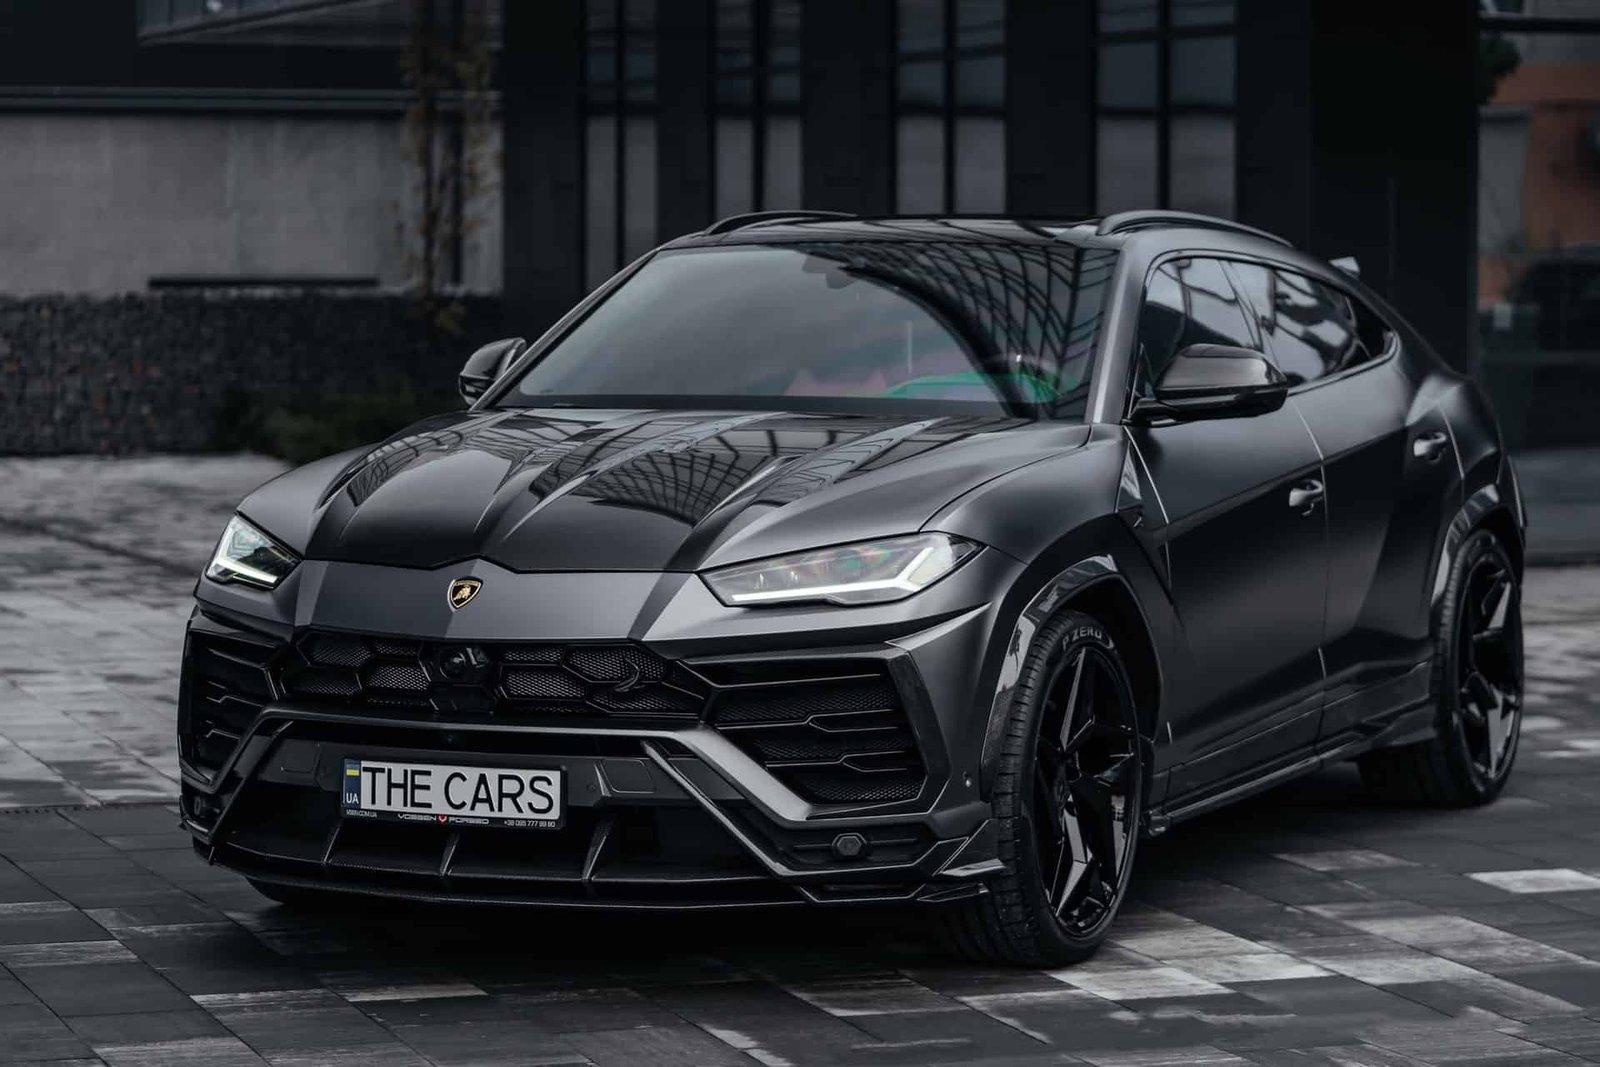 Lamborghini Urus TOPCAR body kit & Stealth Edition Wheels